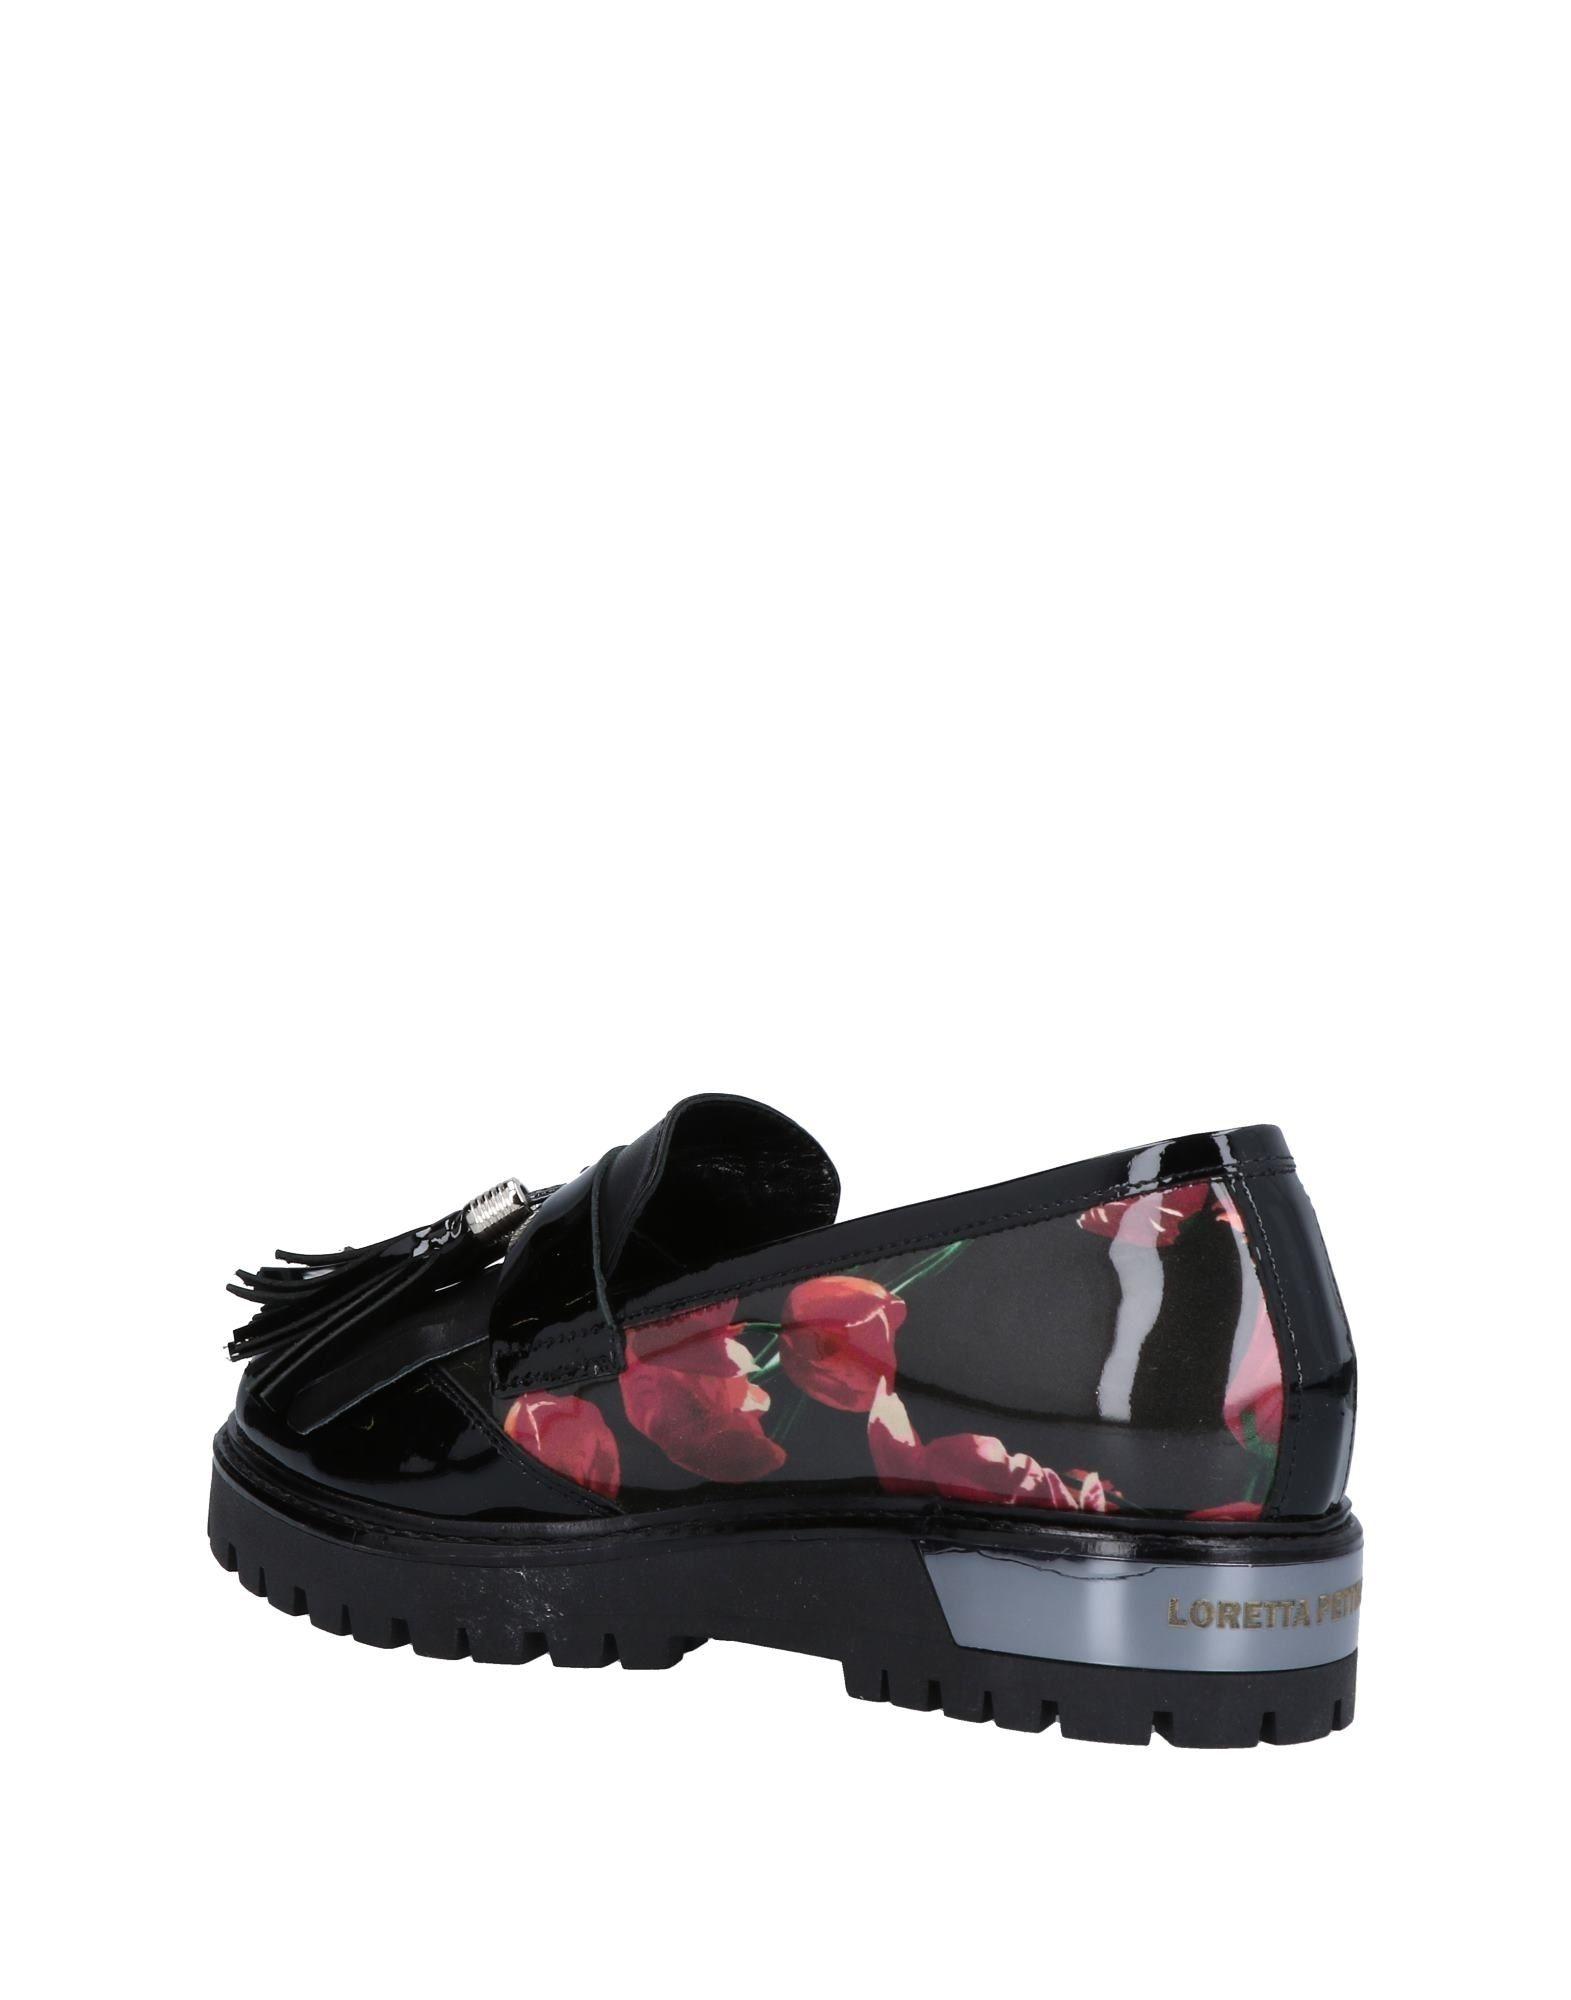 Loretta Schuhe Pettinari Mokassins Damen  11492208HTGut aussehende strapazierfähige Schuhe Loretta f6914d